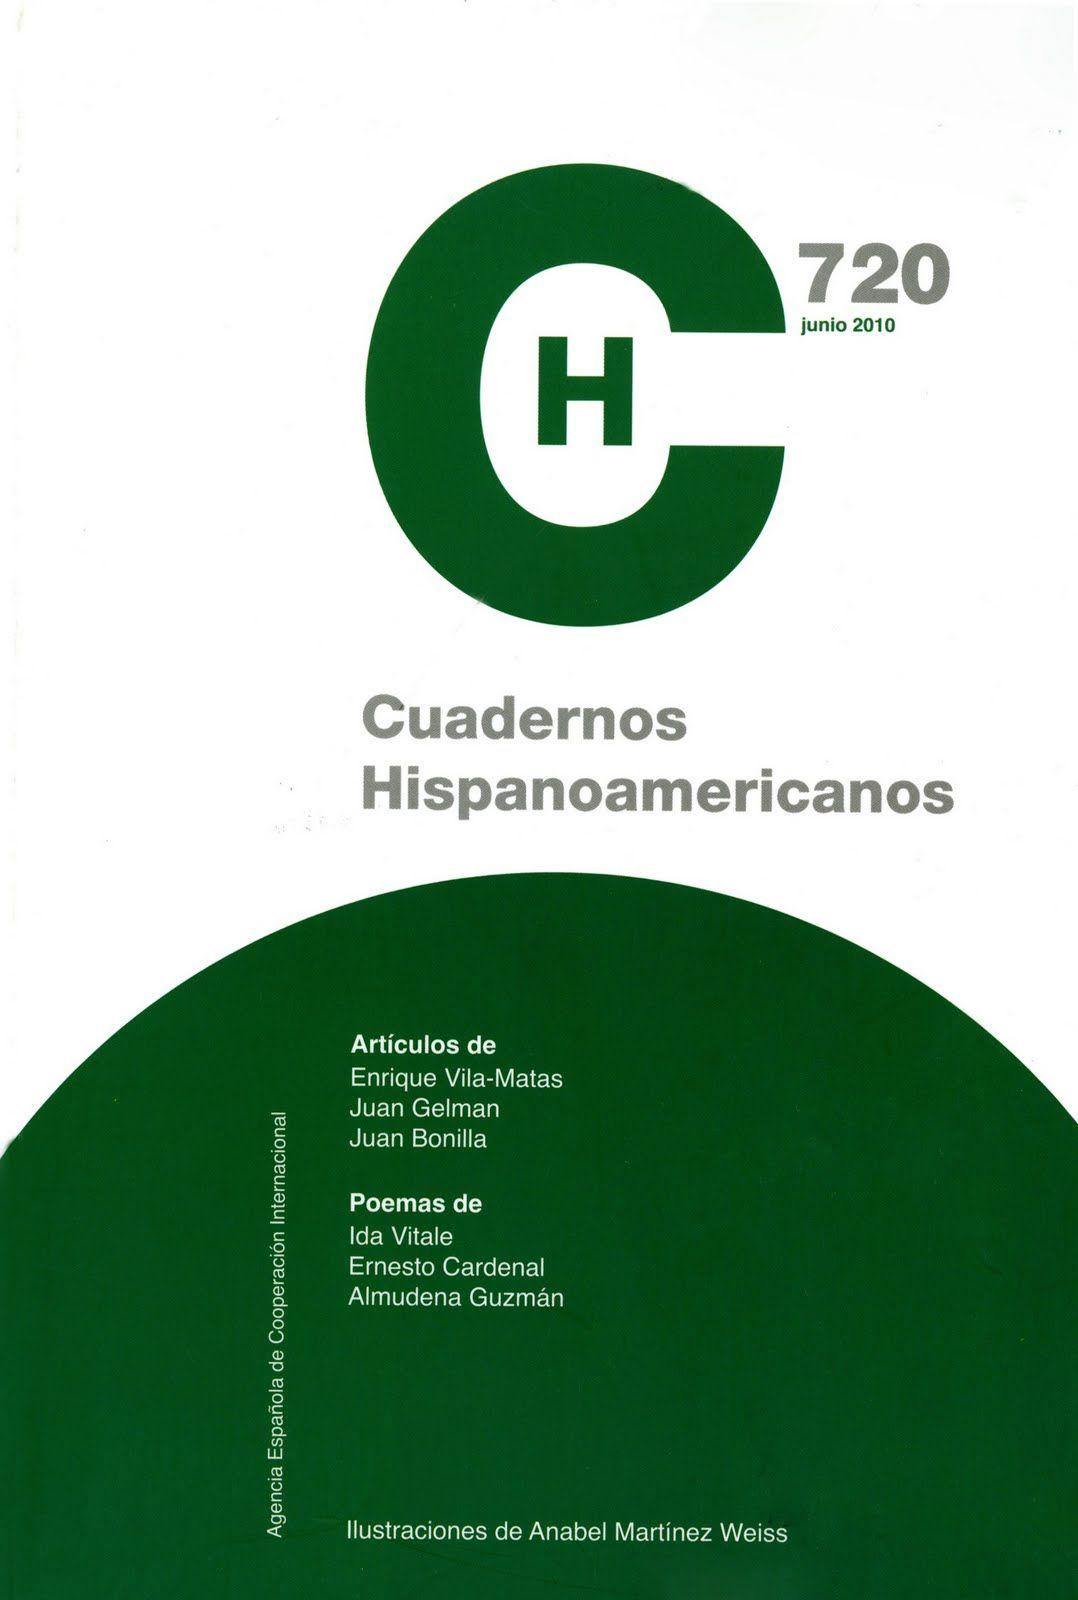 Cuadernos Hispanoamericanos Revista Mensual De Cultura Hispanica